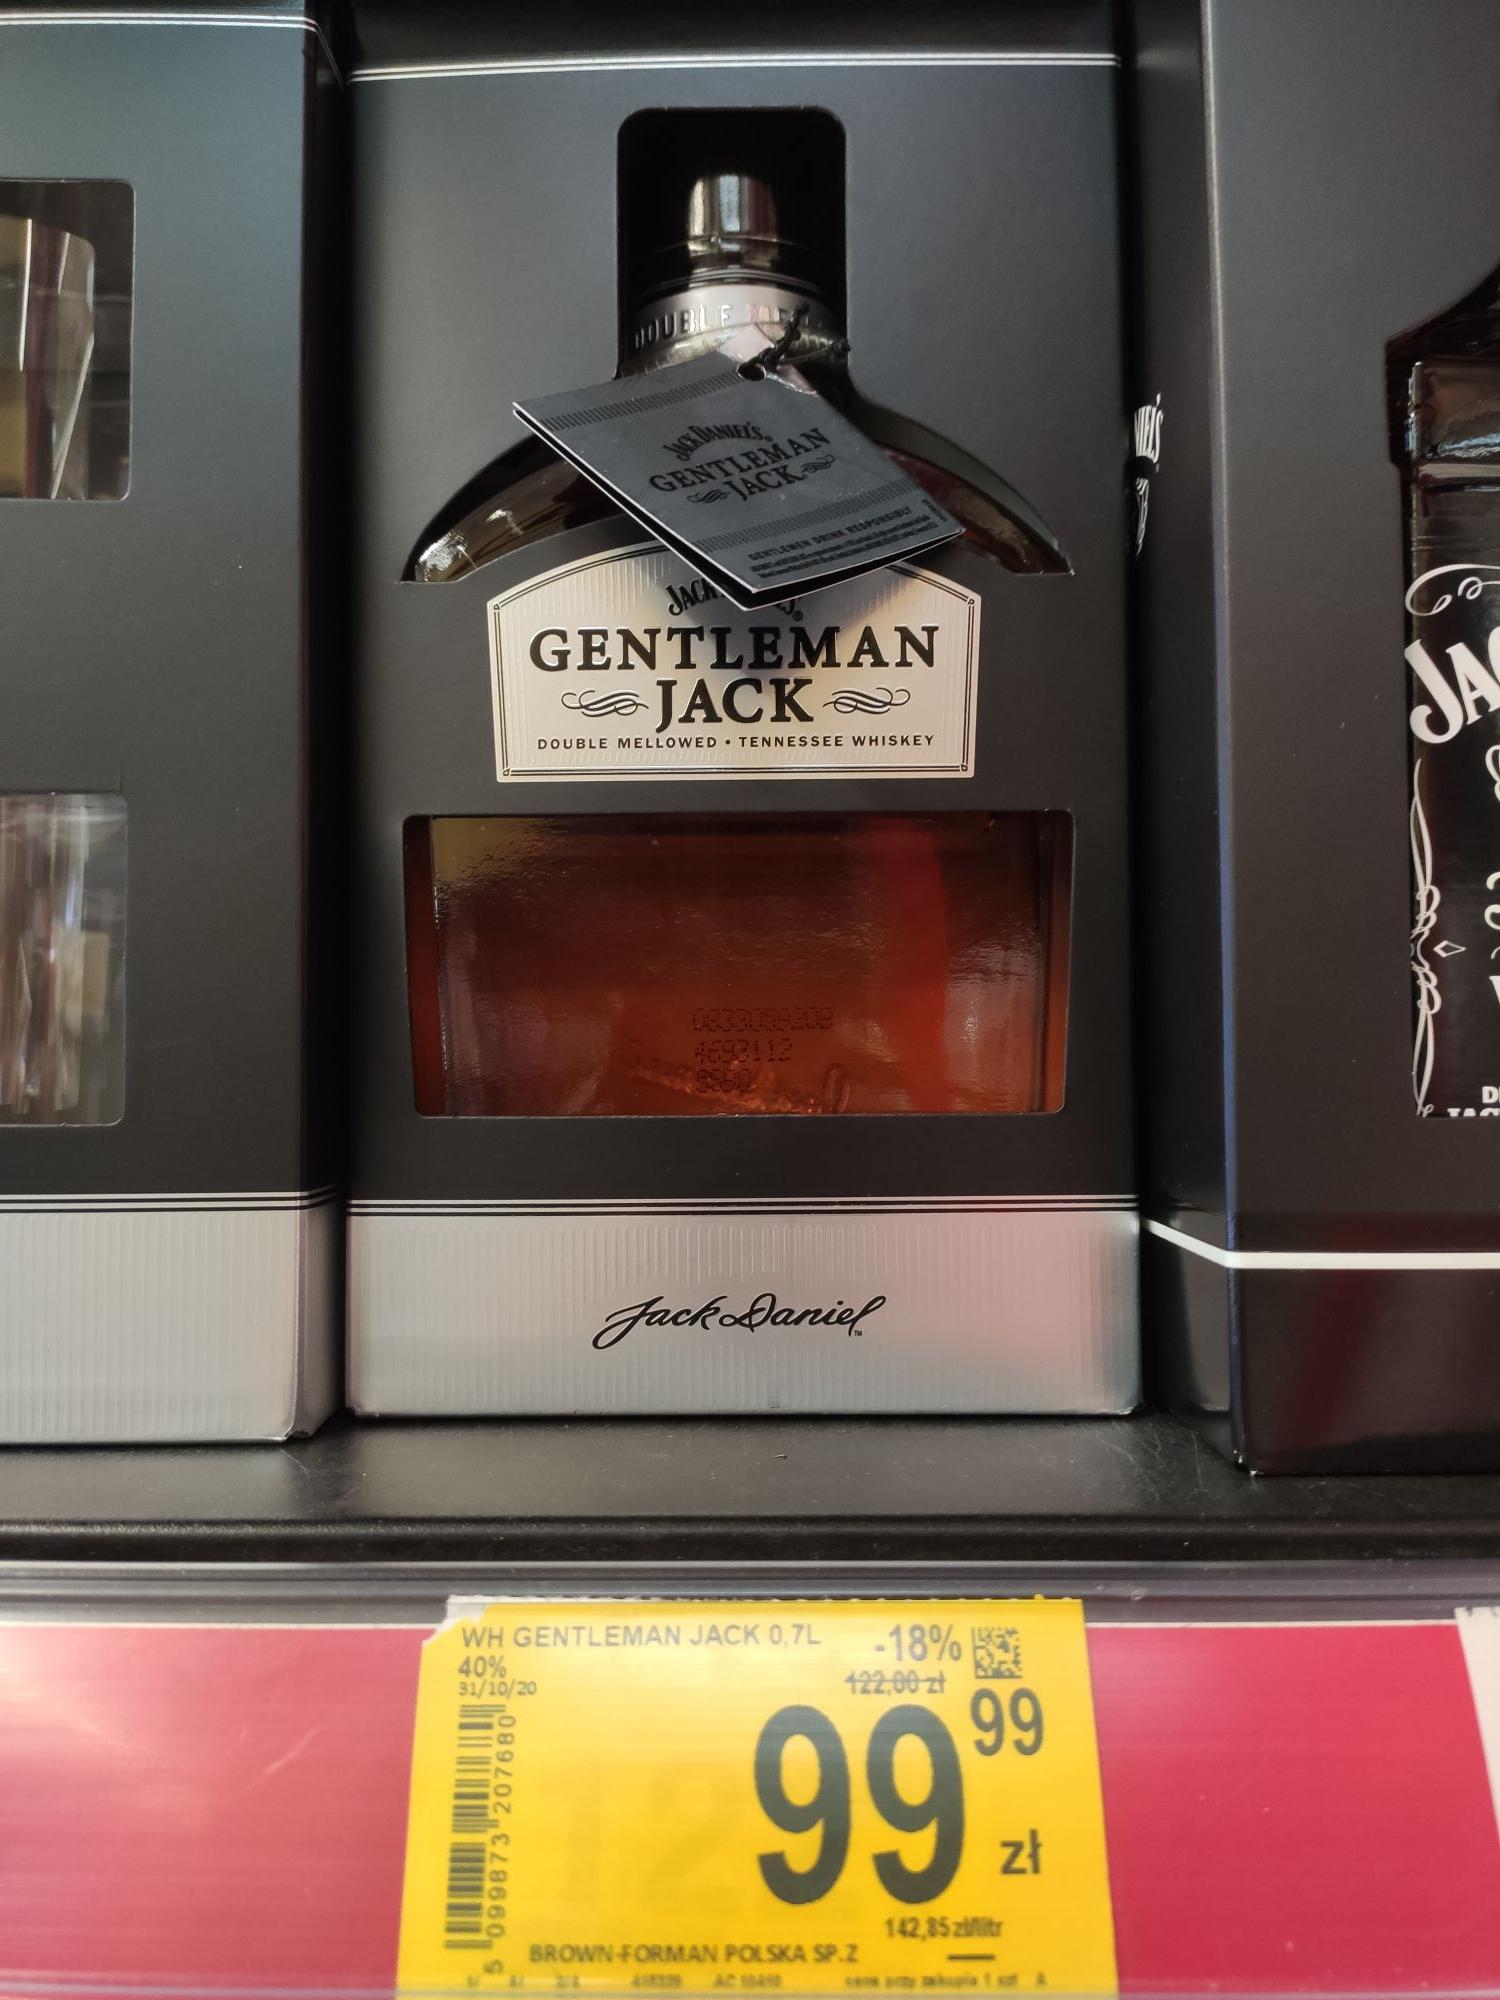 Gentleman Jack 0.7L @ Carrefour